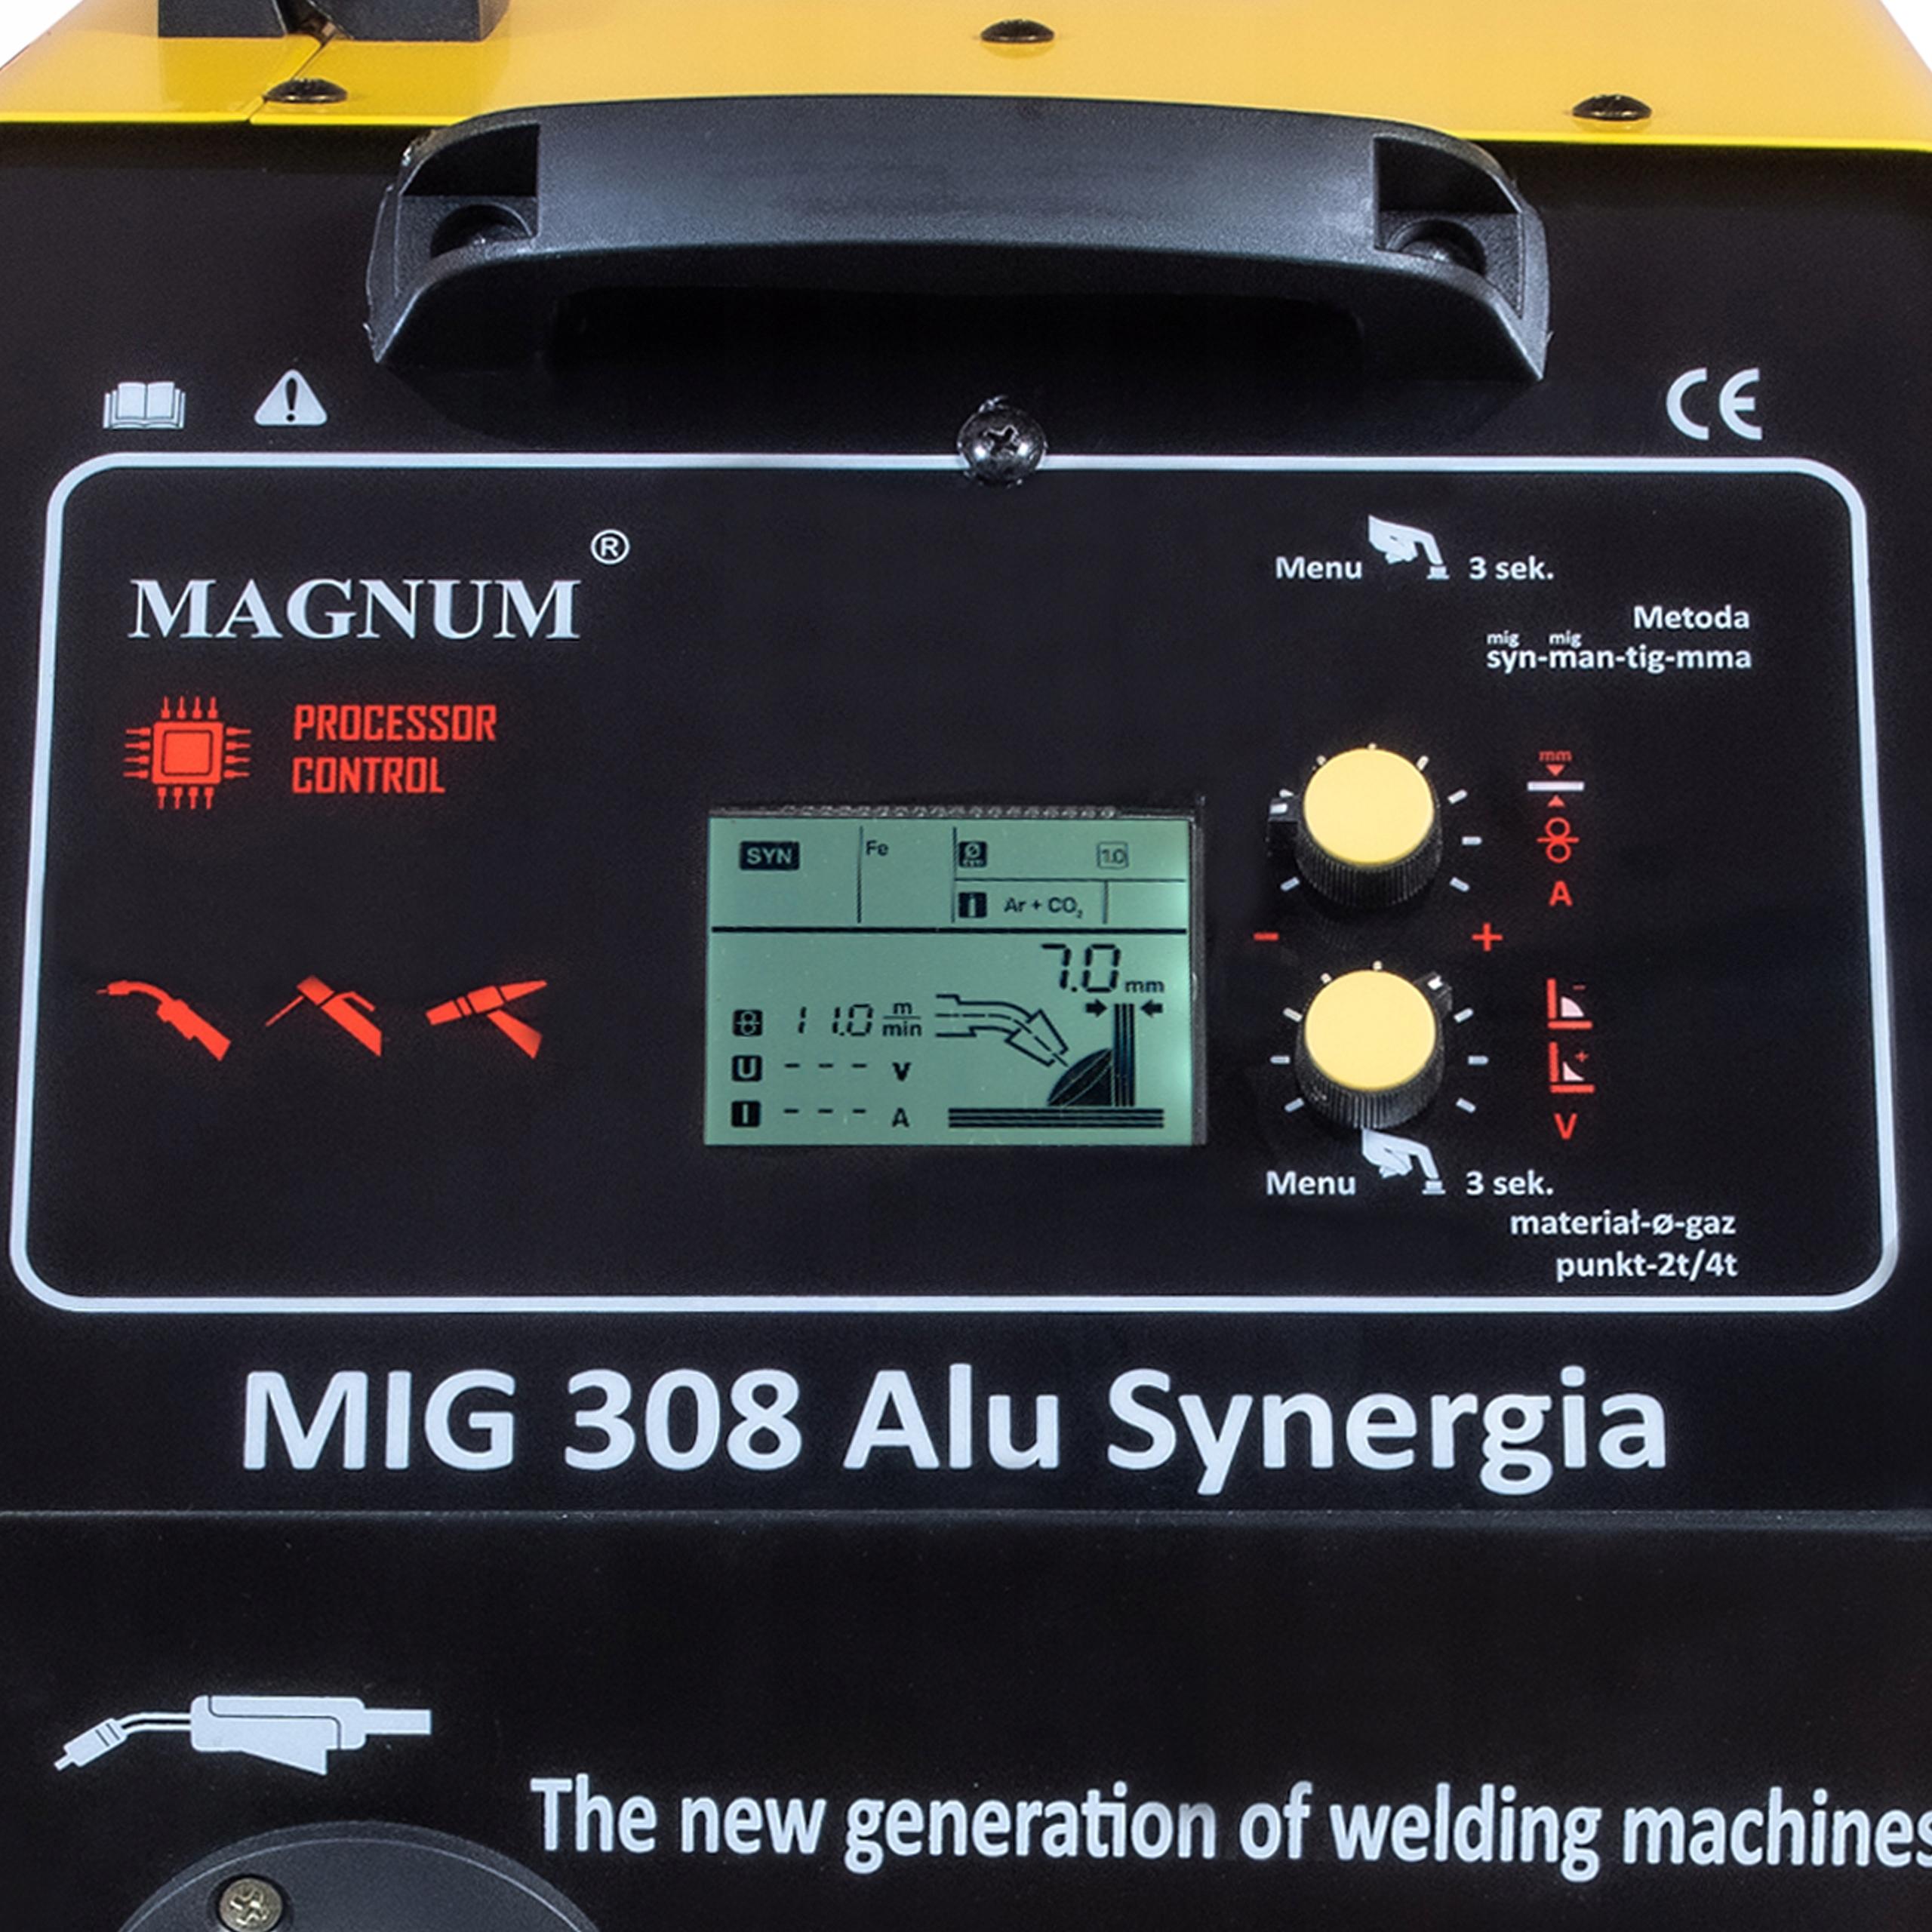 SPAWARKA MIGOMAT MAGNUM MIG 308 ALU SYNERGIA 400V Napięcie zasilania (V) 400